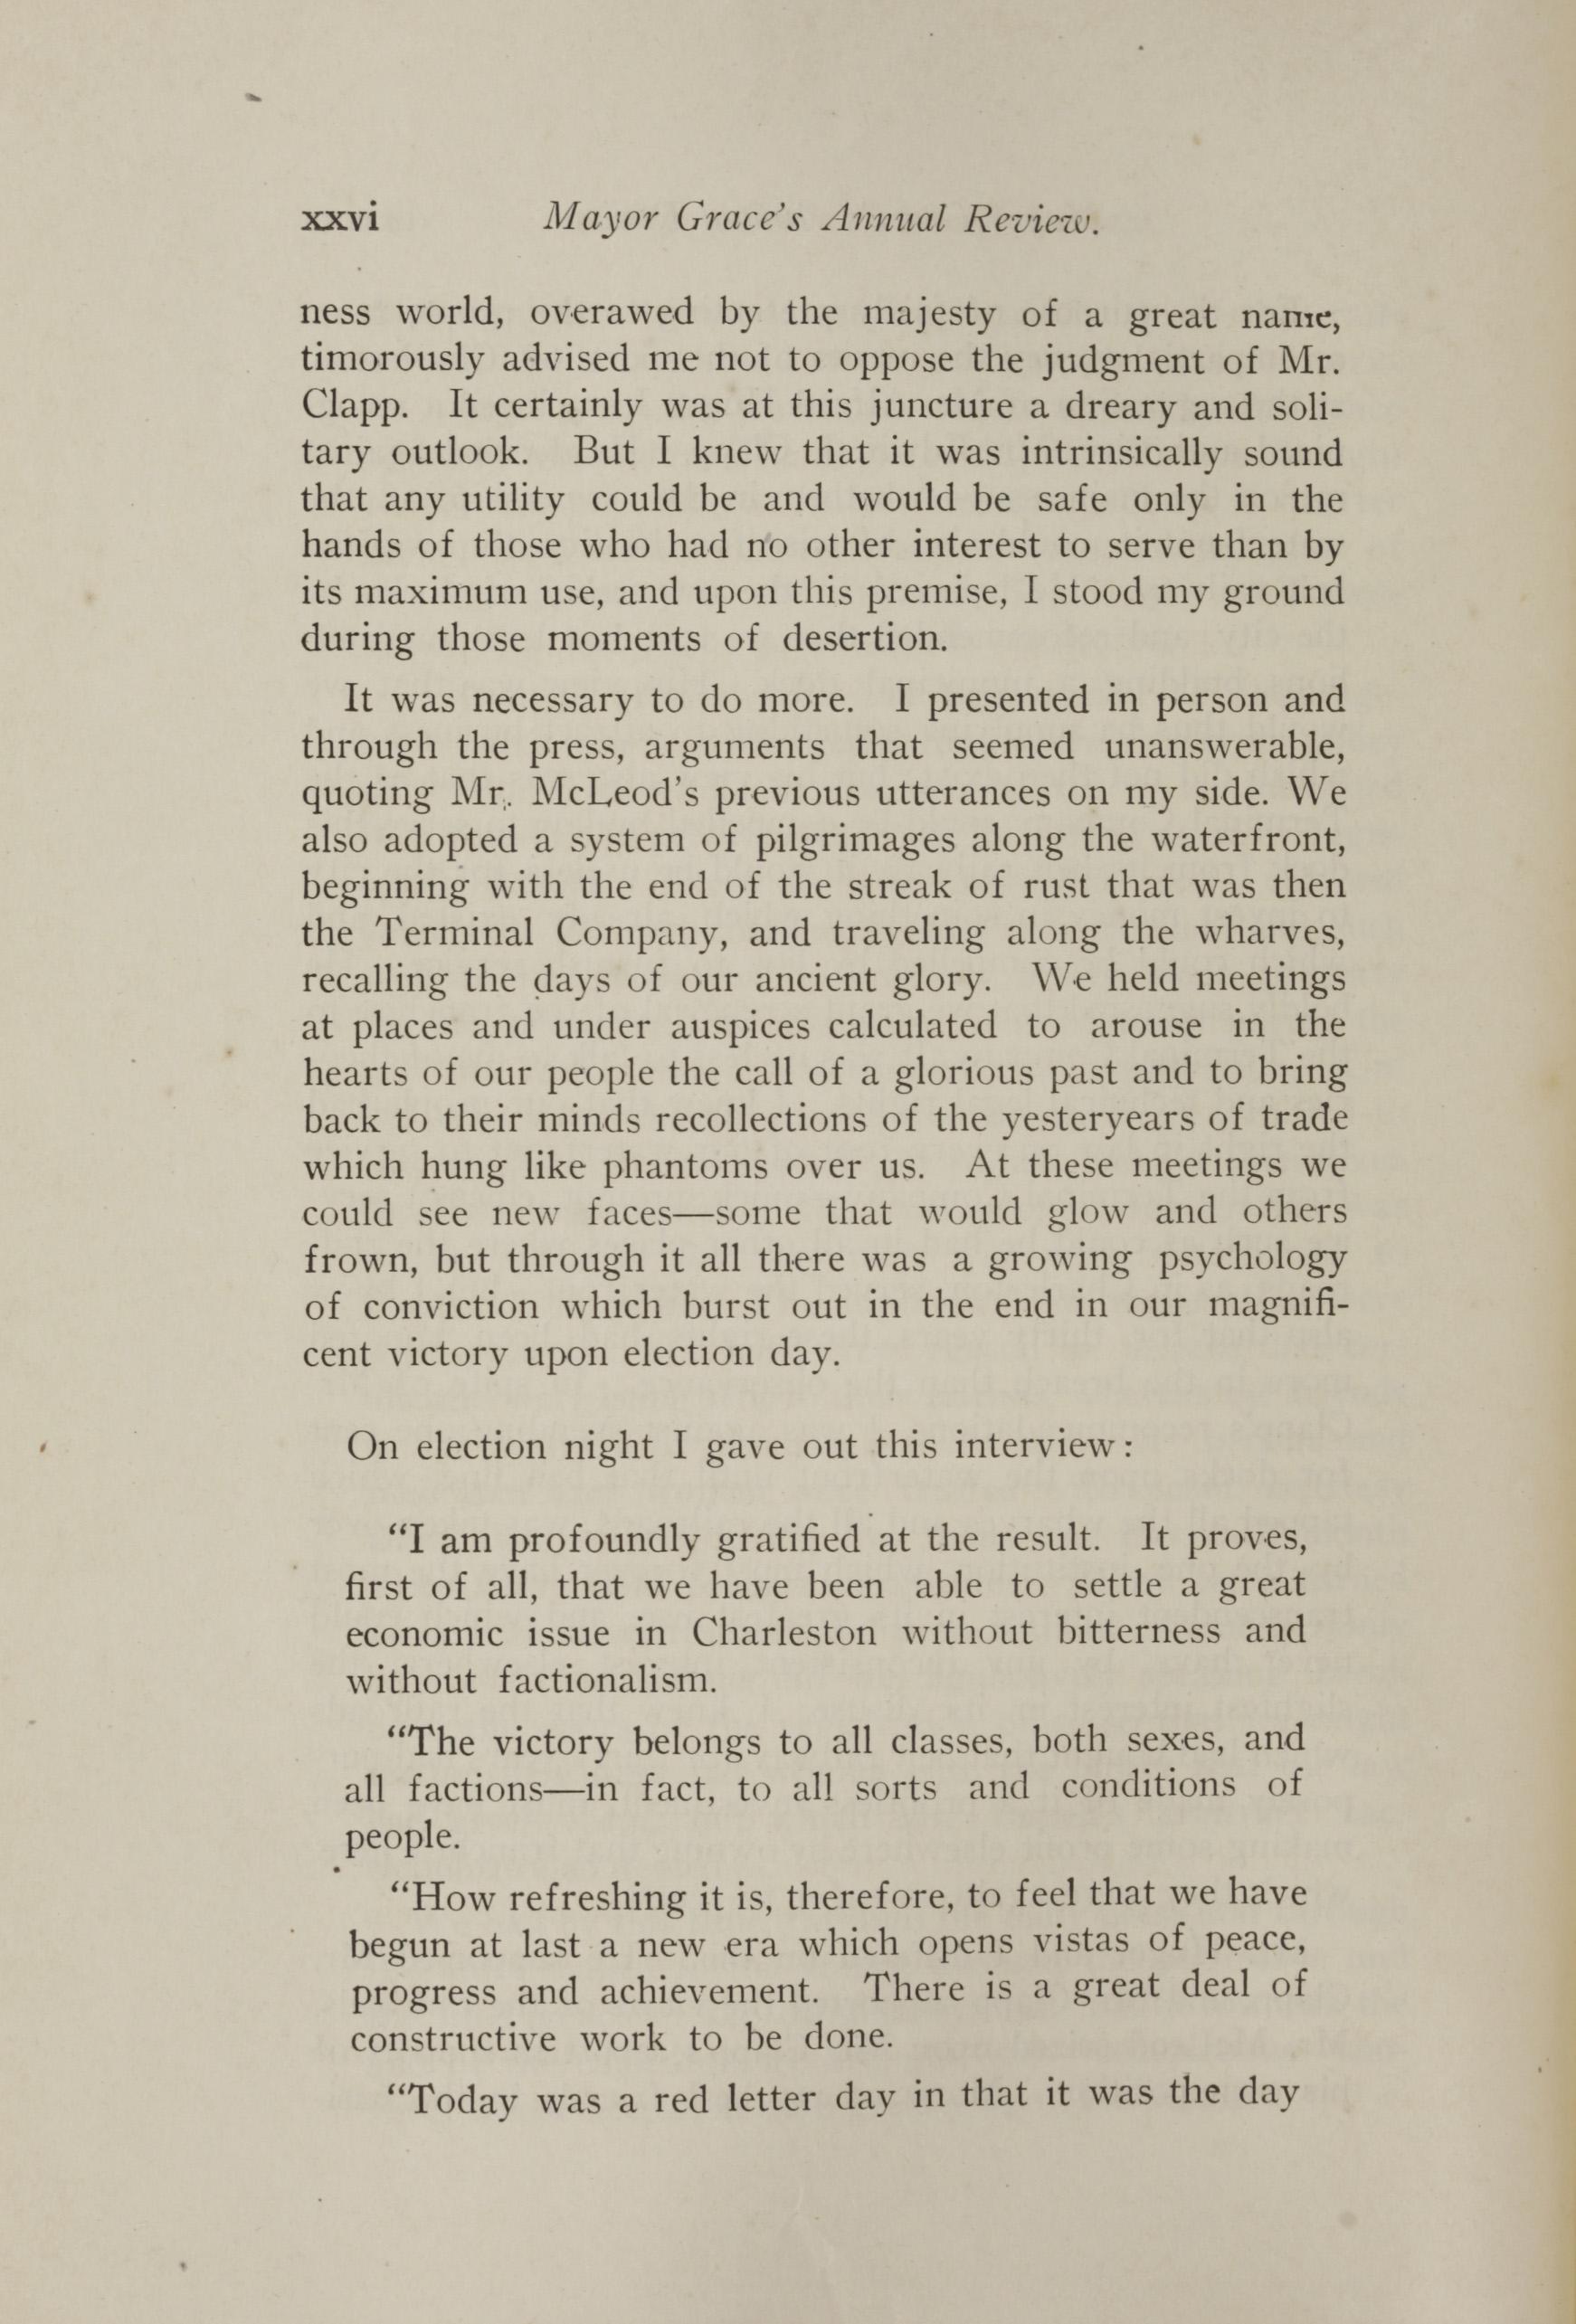 Charleston Yearbook, 1921, page xxvi